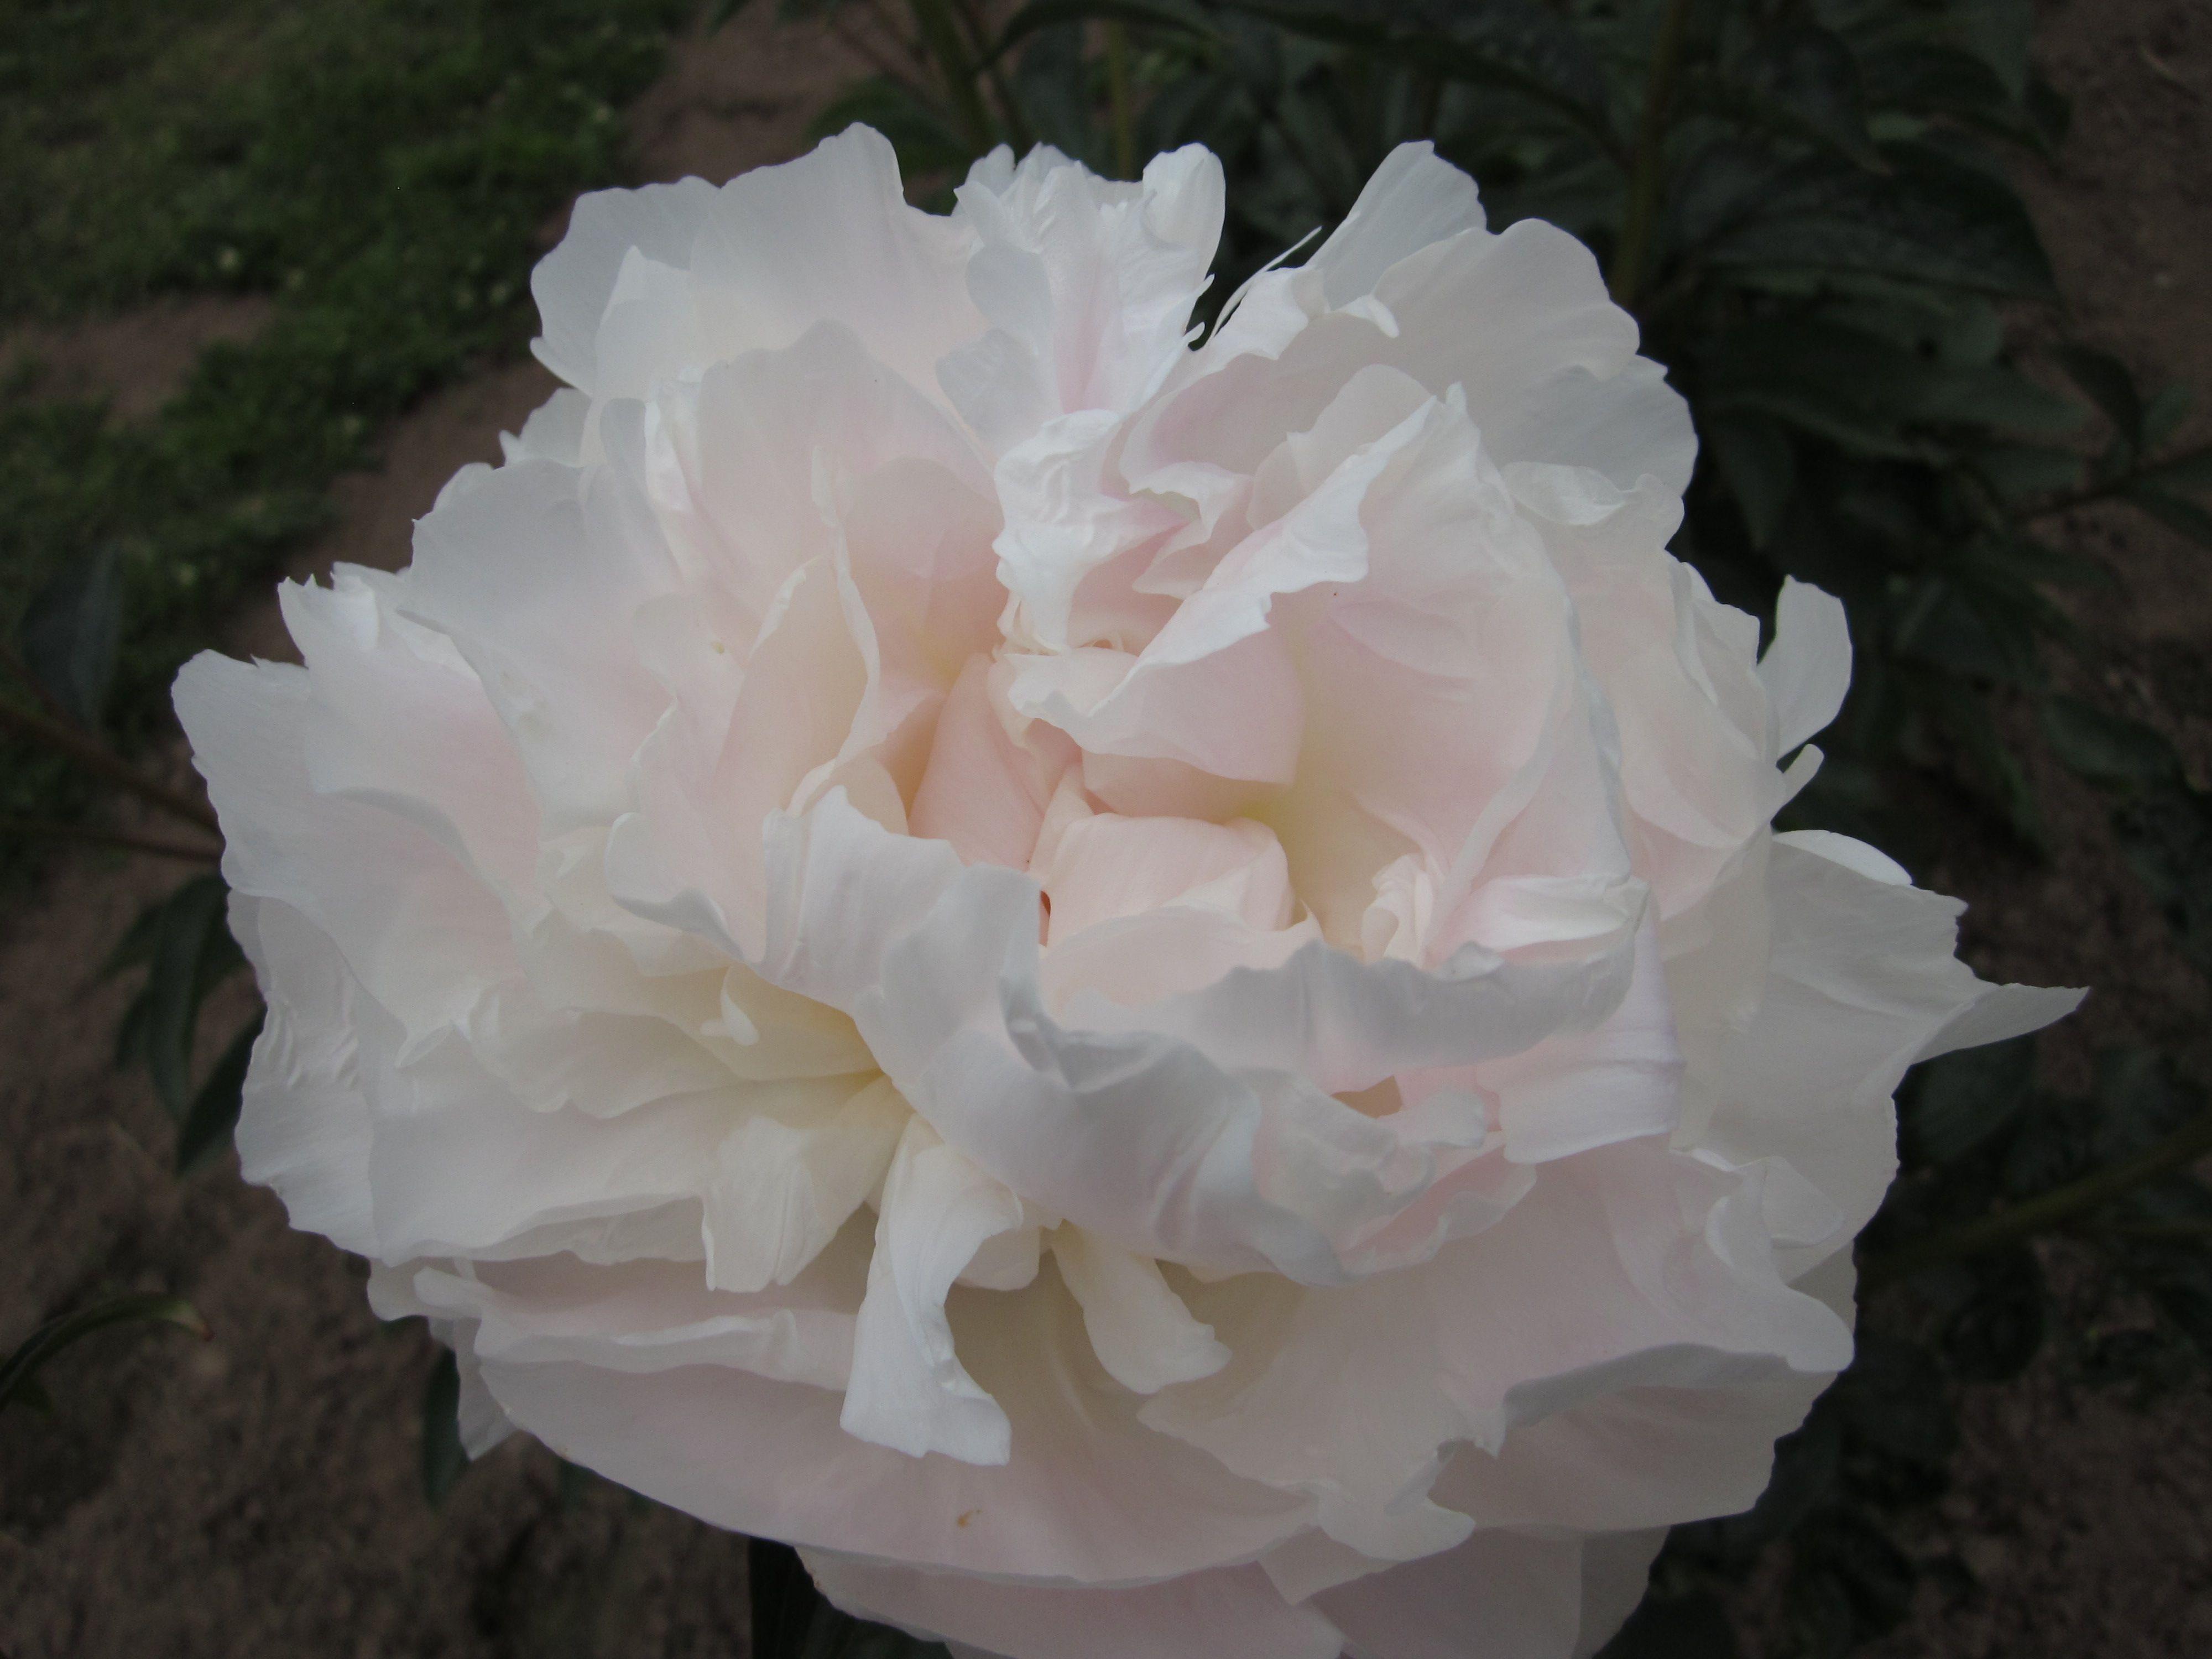 Camillia white peony fabulous flower fabulous fragrance peonies camillia white peony fabulous flower fabulous fragrance mightylinksfo